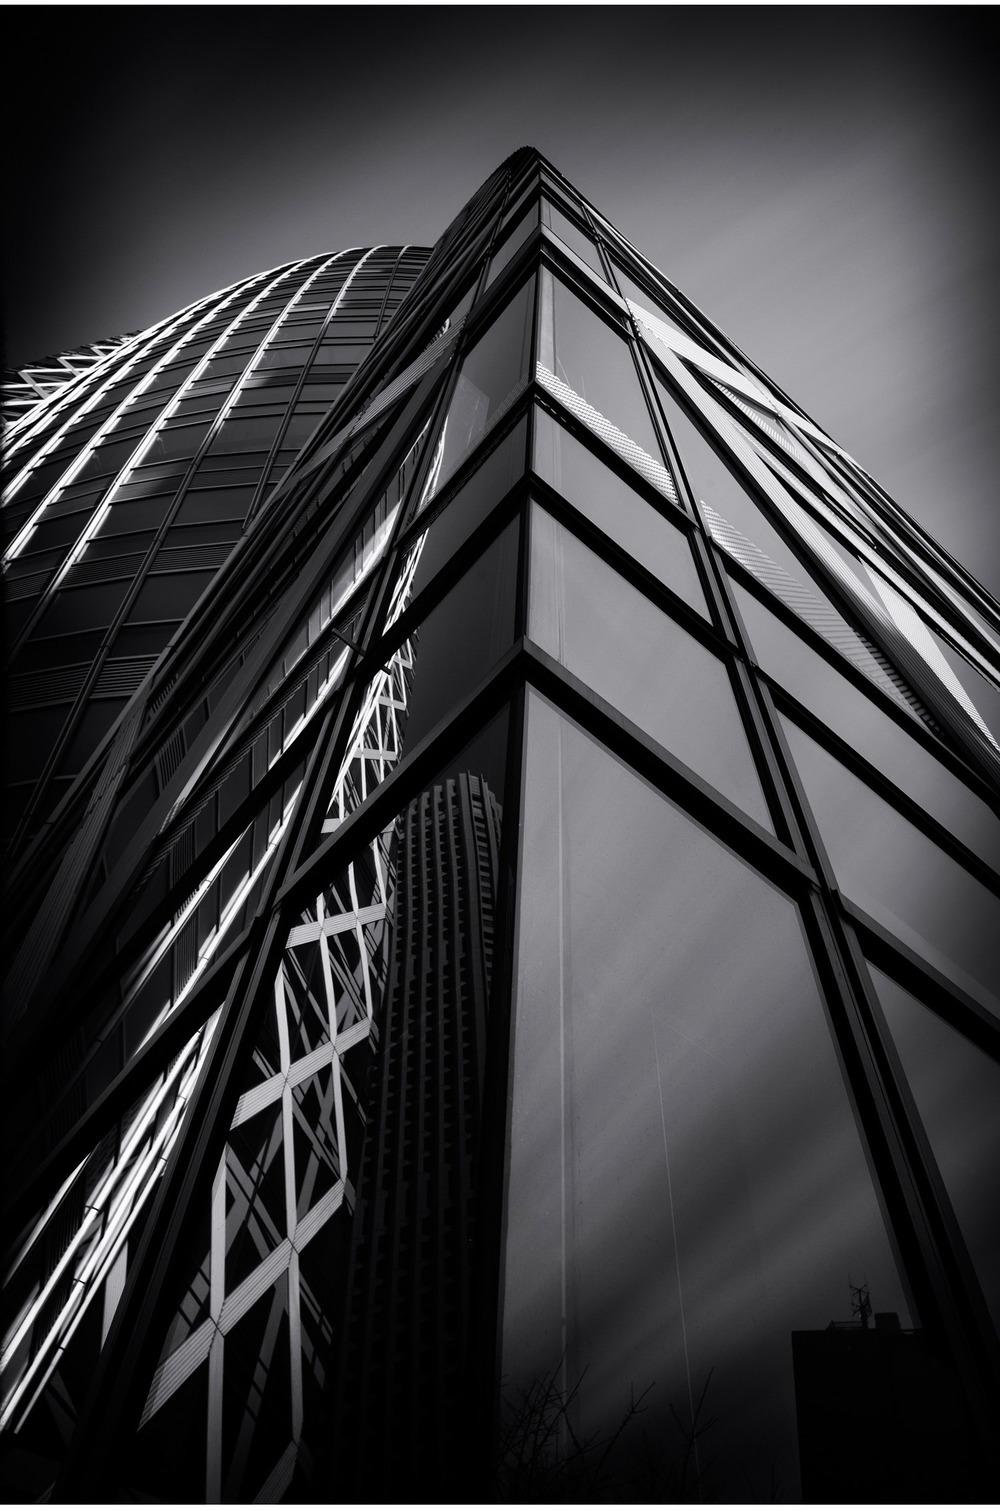 009-Japan-Architecture.jpg